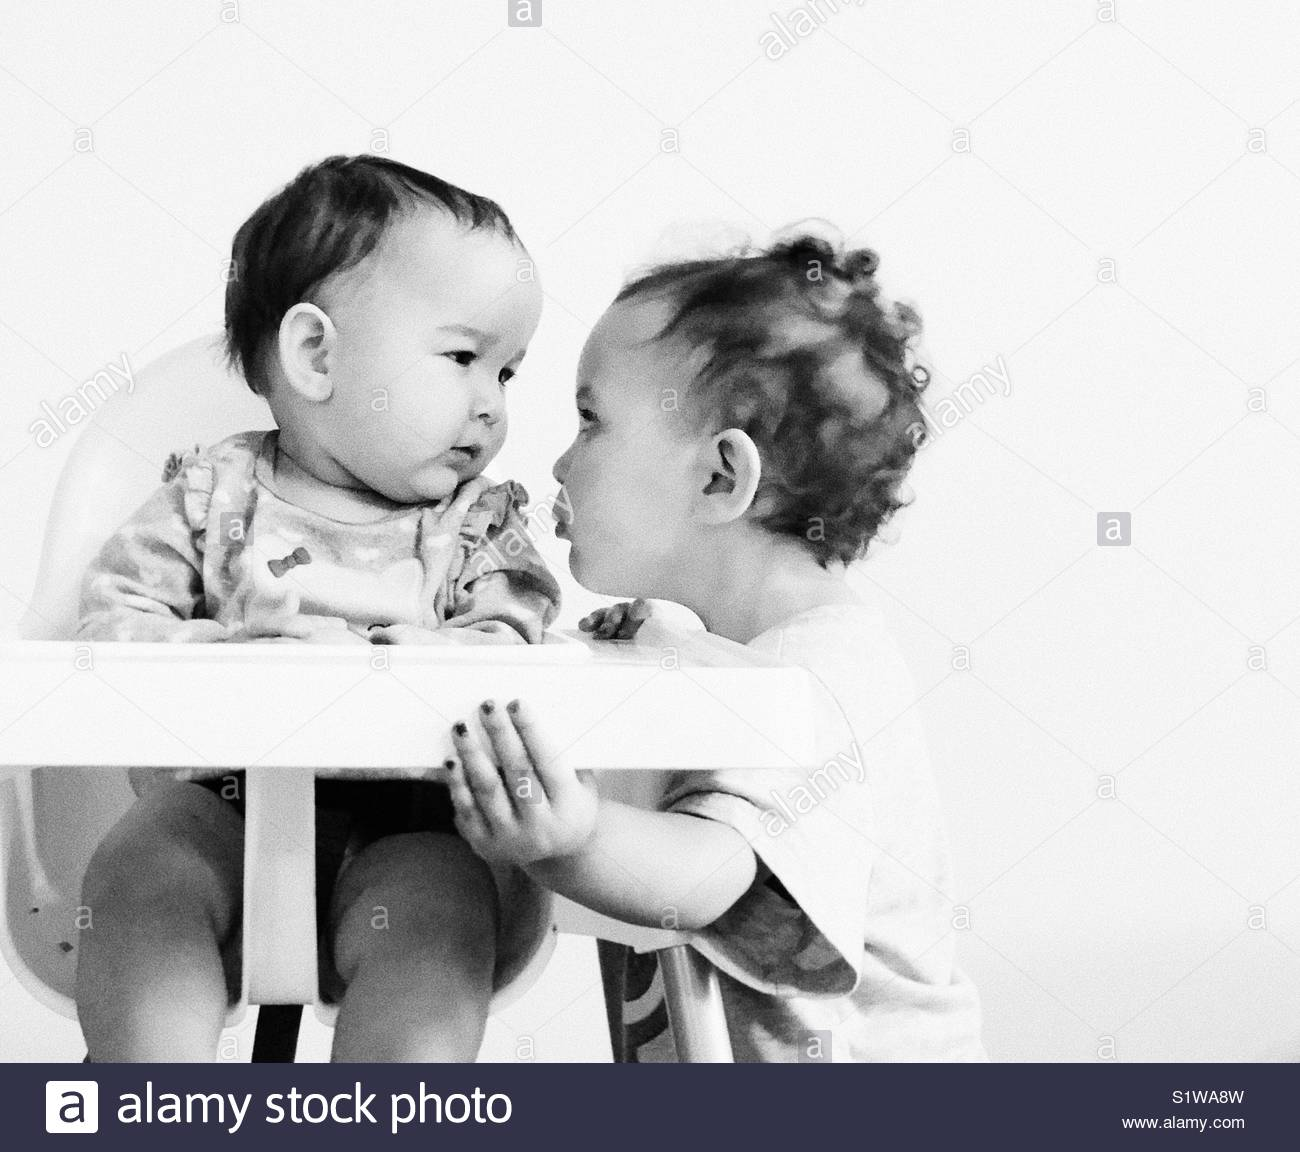 I gemelli amore. Immagini Stock